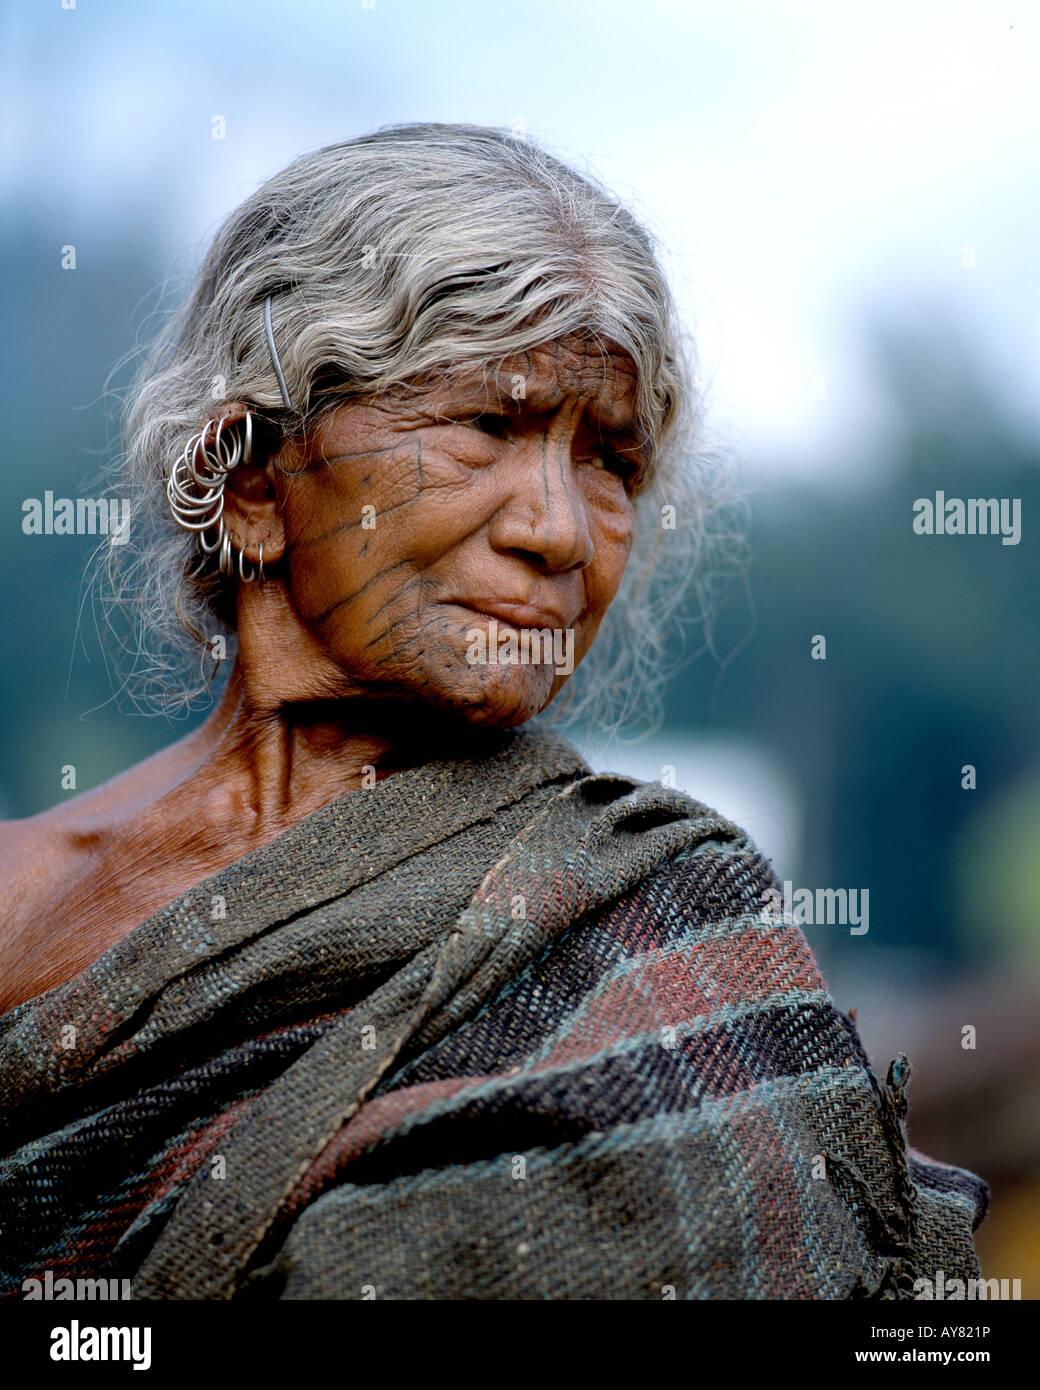 Mujer con tribales tatuajes faciales, Orissa, India Imagen De Stock